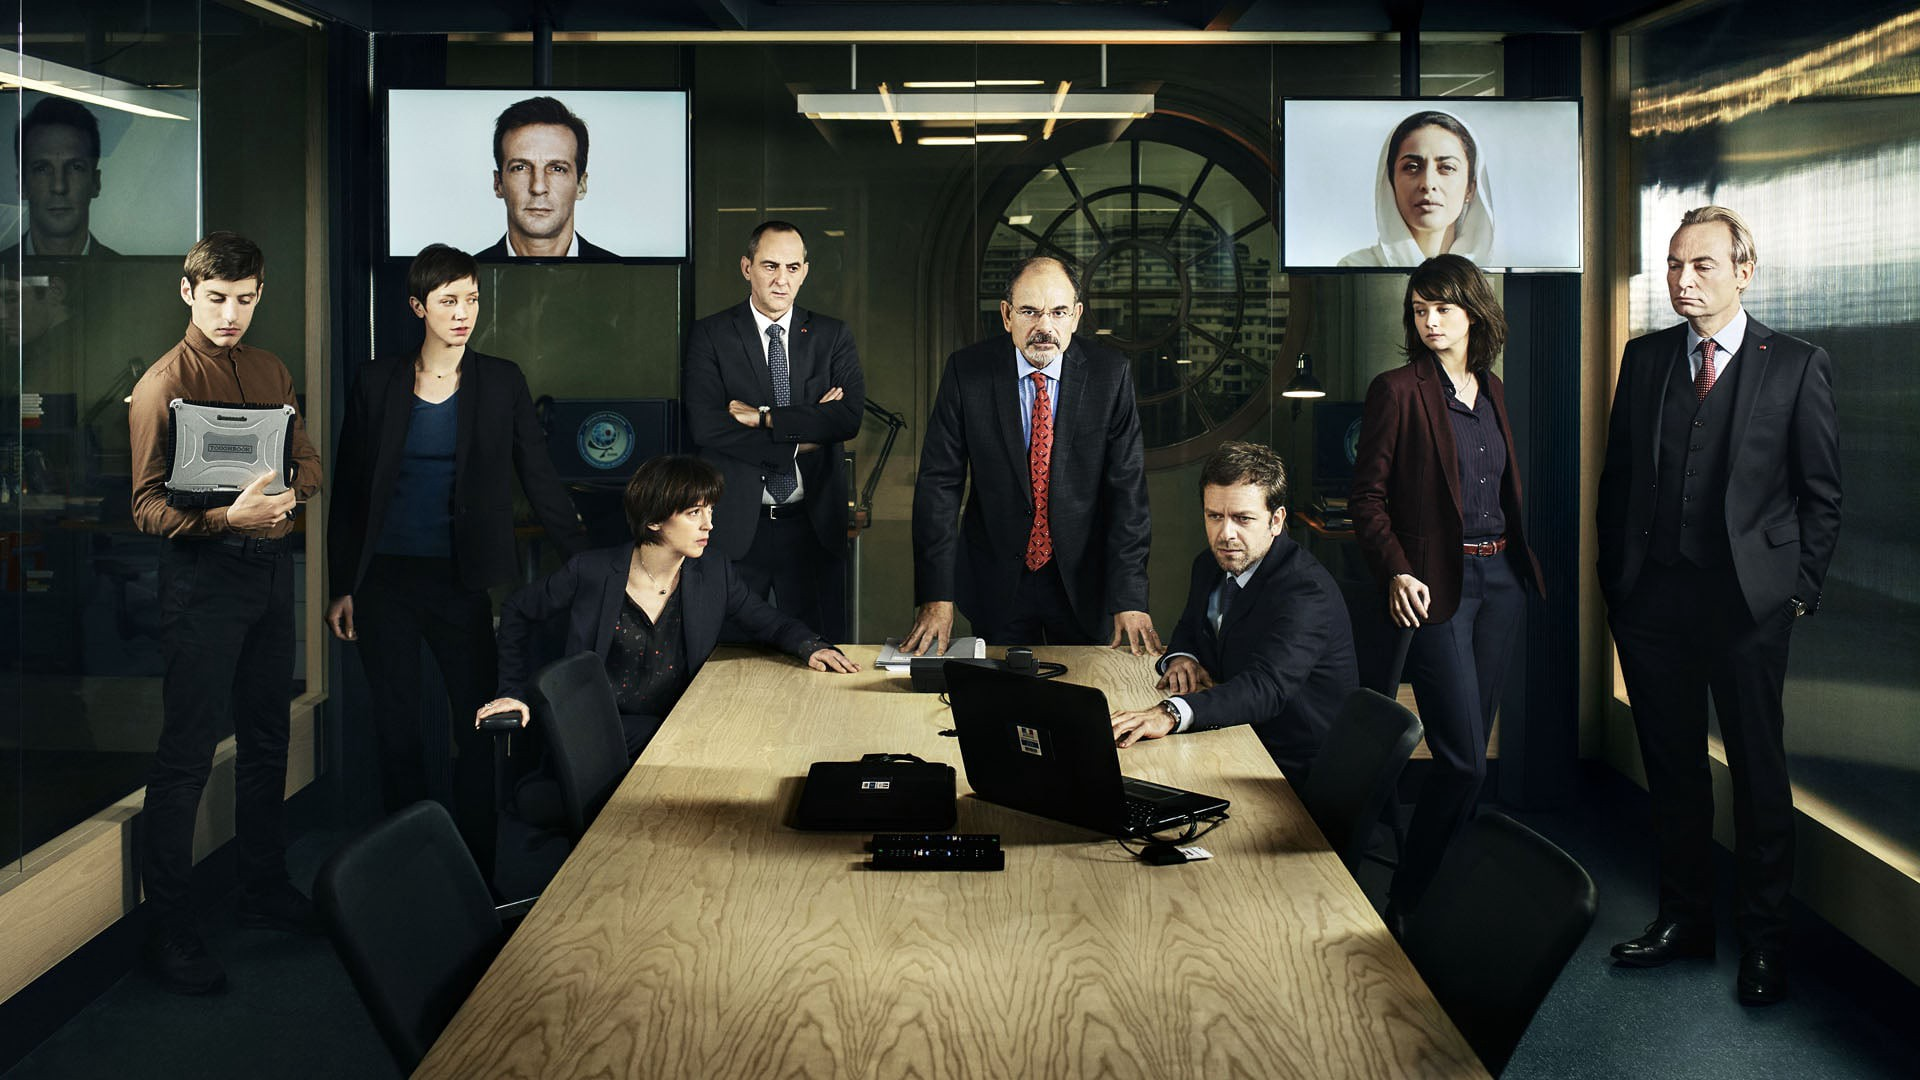 The Bureau (Le Bureau des Légendes) Season 6: update, Plot, Trailer and All You Need To Know